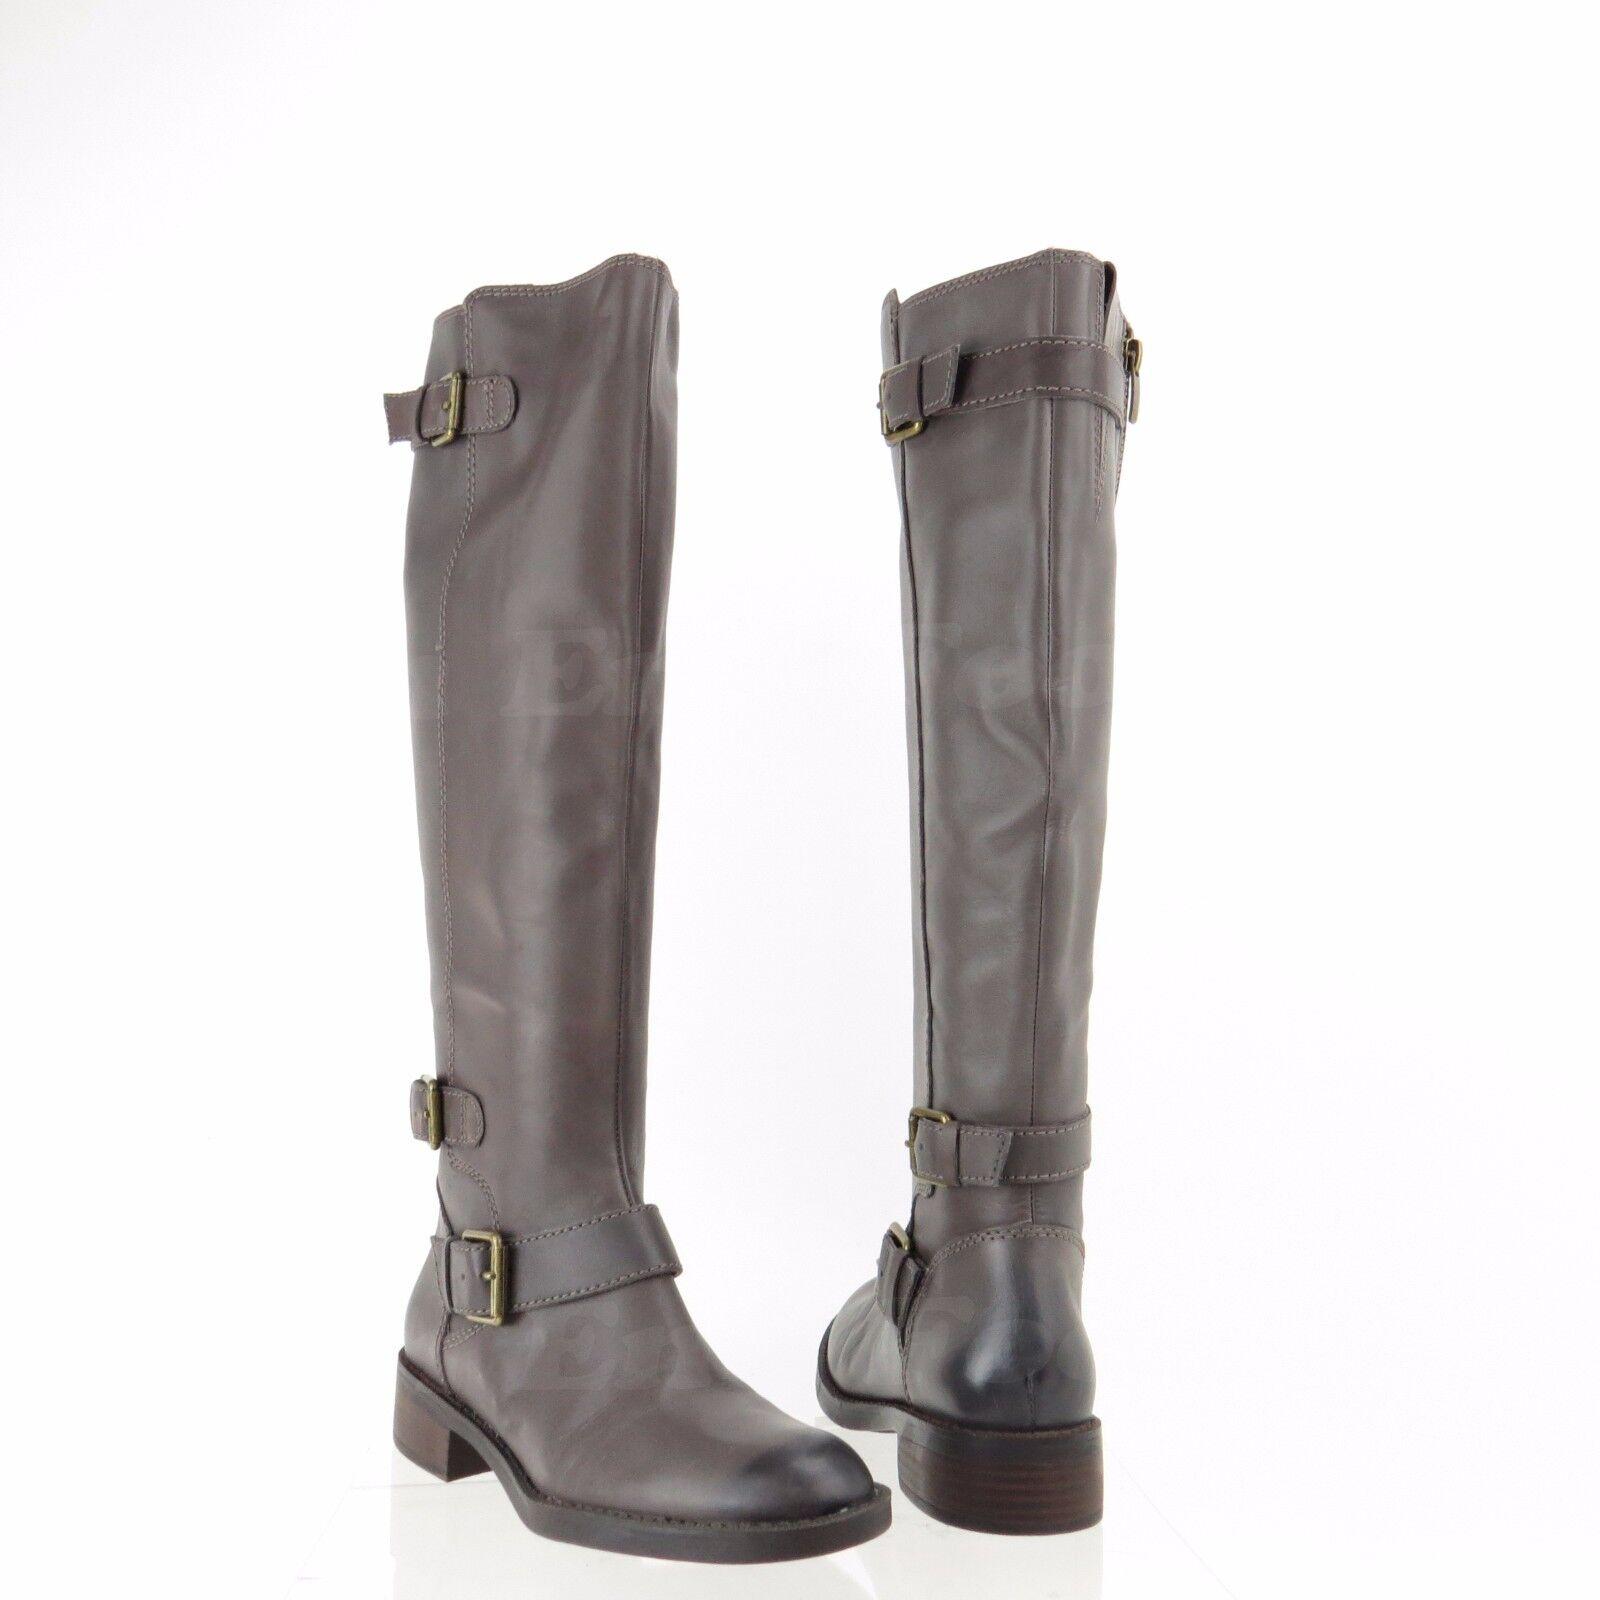 Enzo Angiolini Sayin Damenschuhe Schuhes Gray Leder Knee High Stiefel Größe 6 M NEU 200